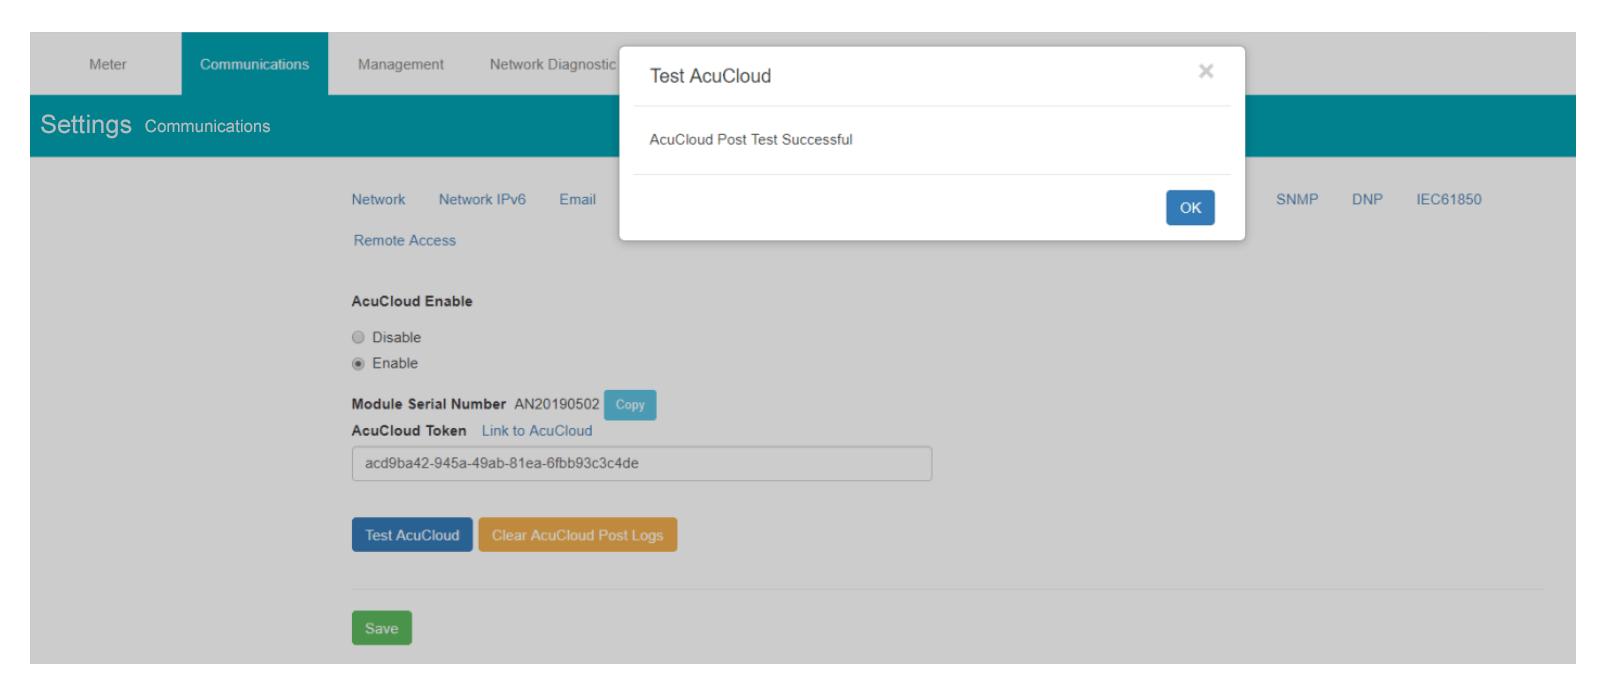 Test AcuCloud